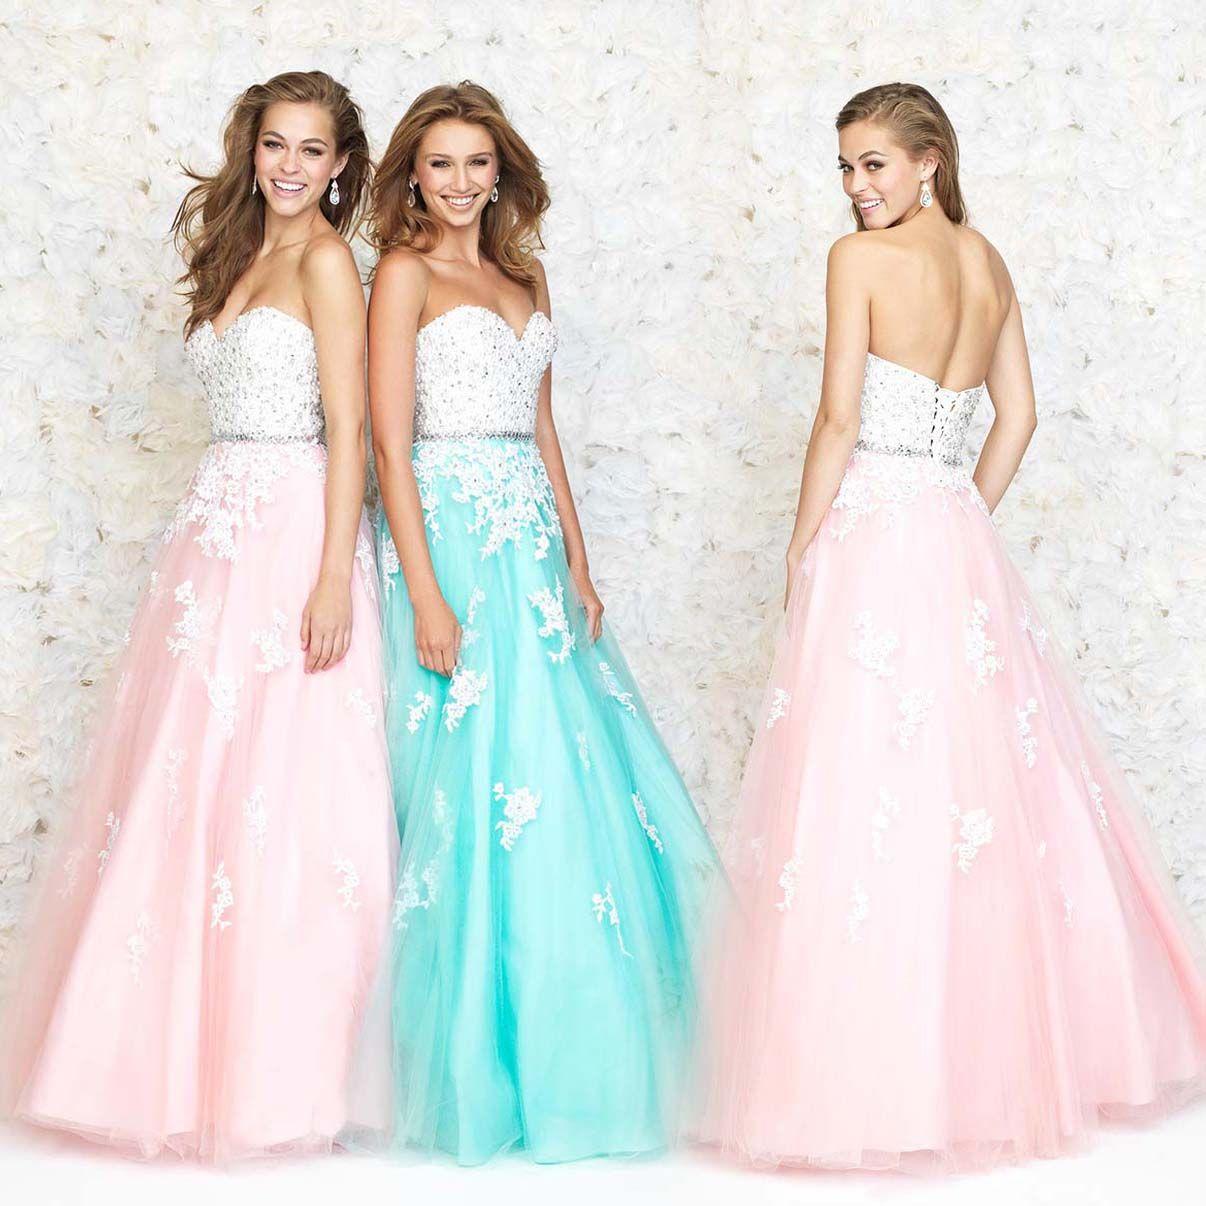 Luxury Spring 2015 Prom Dresses Illustration - All Wedding Dresses ...